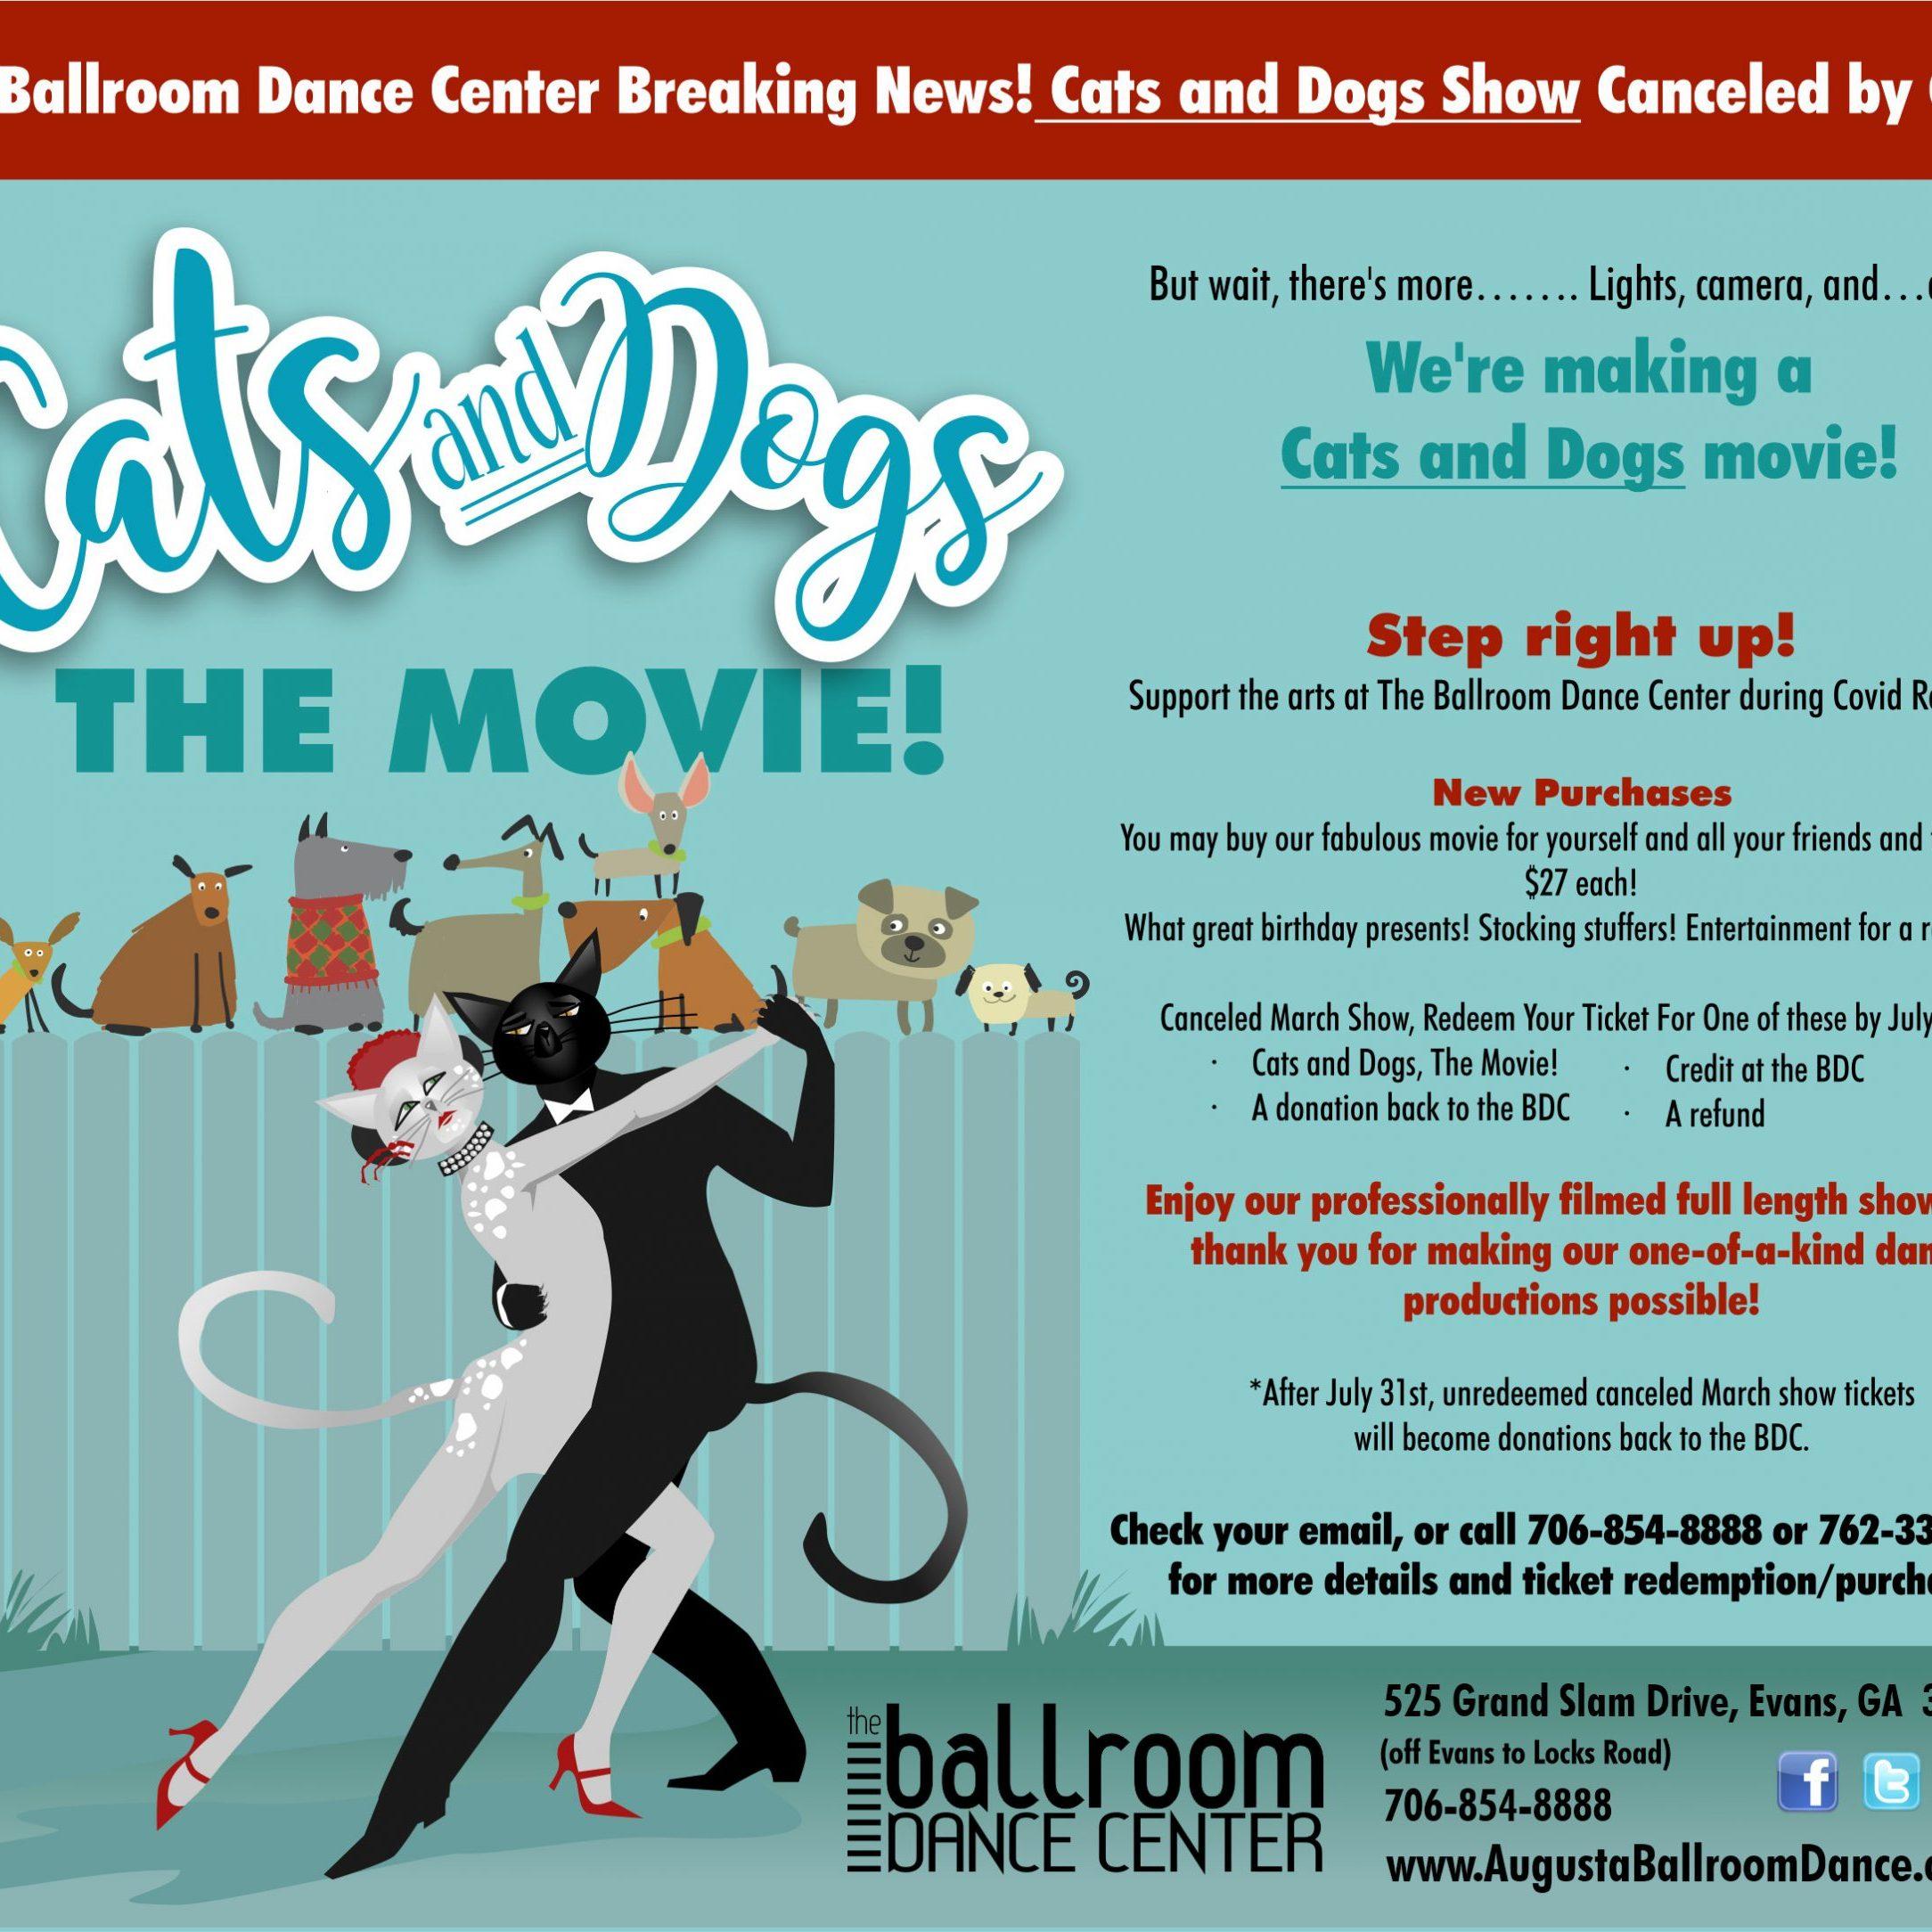 BDC020catsanddogsMOVIEsocialmedia (1)